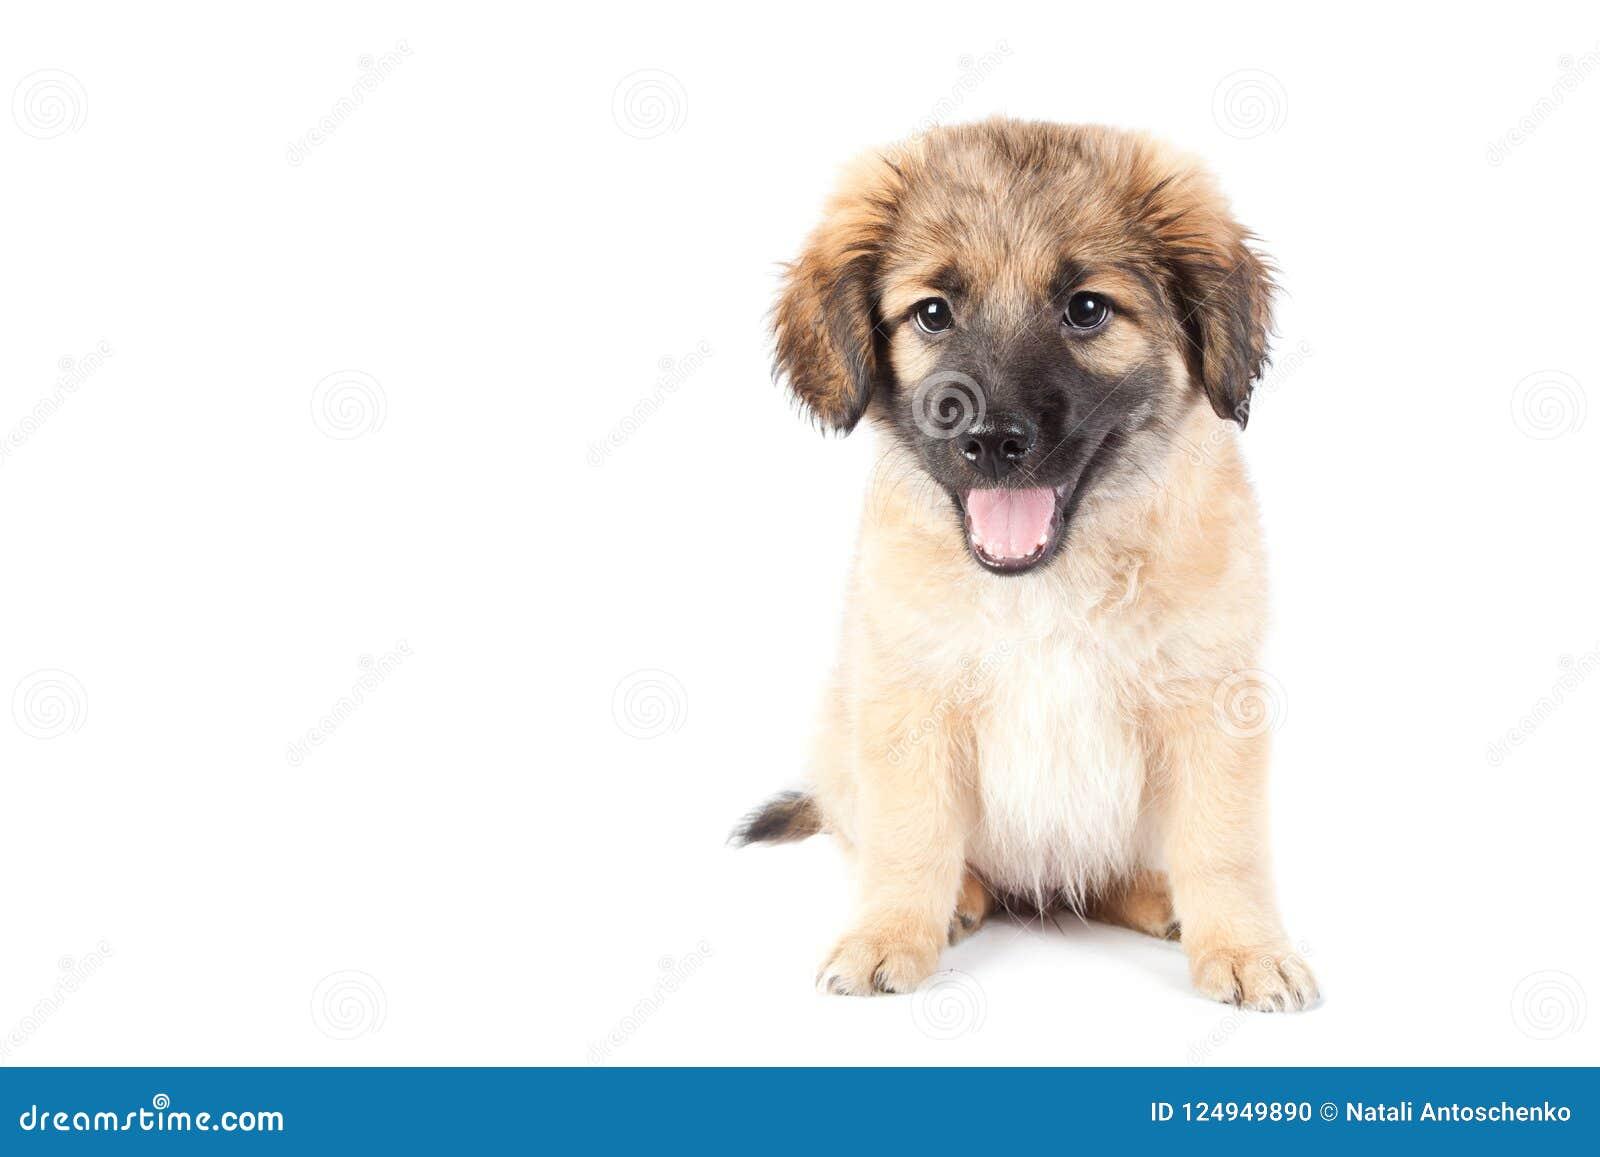 Smiles Puppy Of A Golden Retriever Shepherd Funny Cute Dog Smiling Stock Photo Image Of Mammal Retriver 124949890